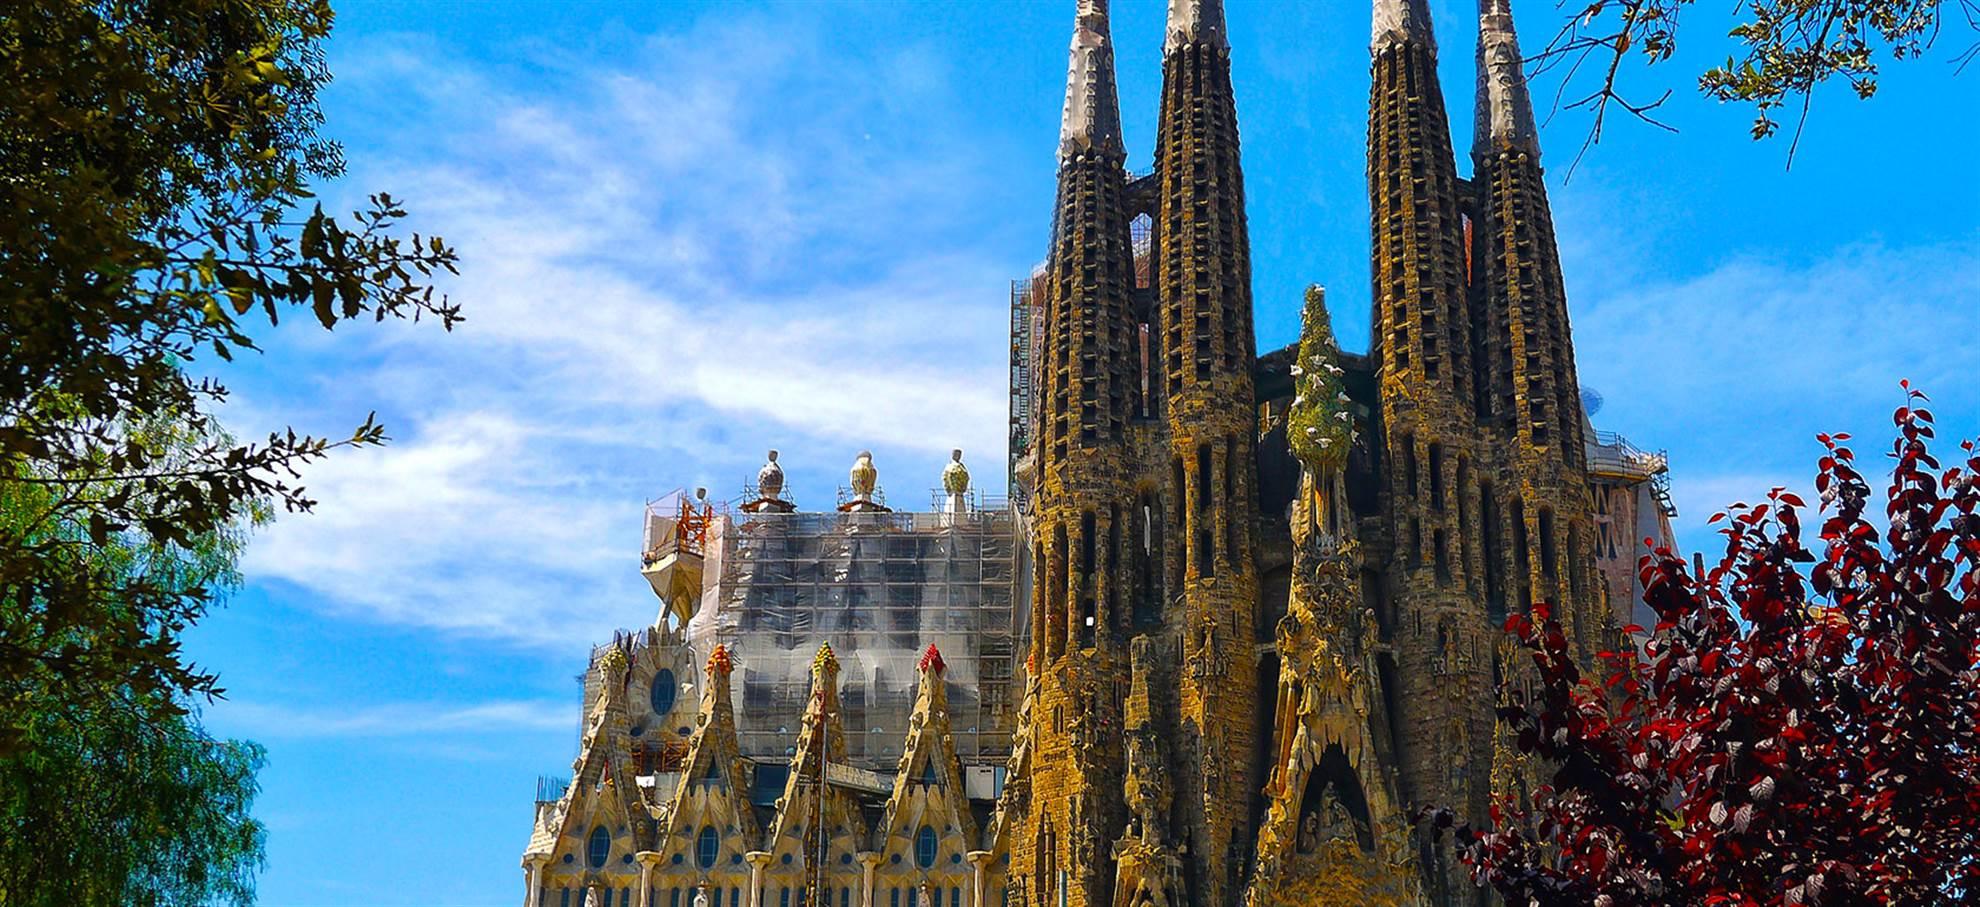 Sagrada Familia-biljett + Ljudguide & Hop on Hop off Buss